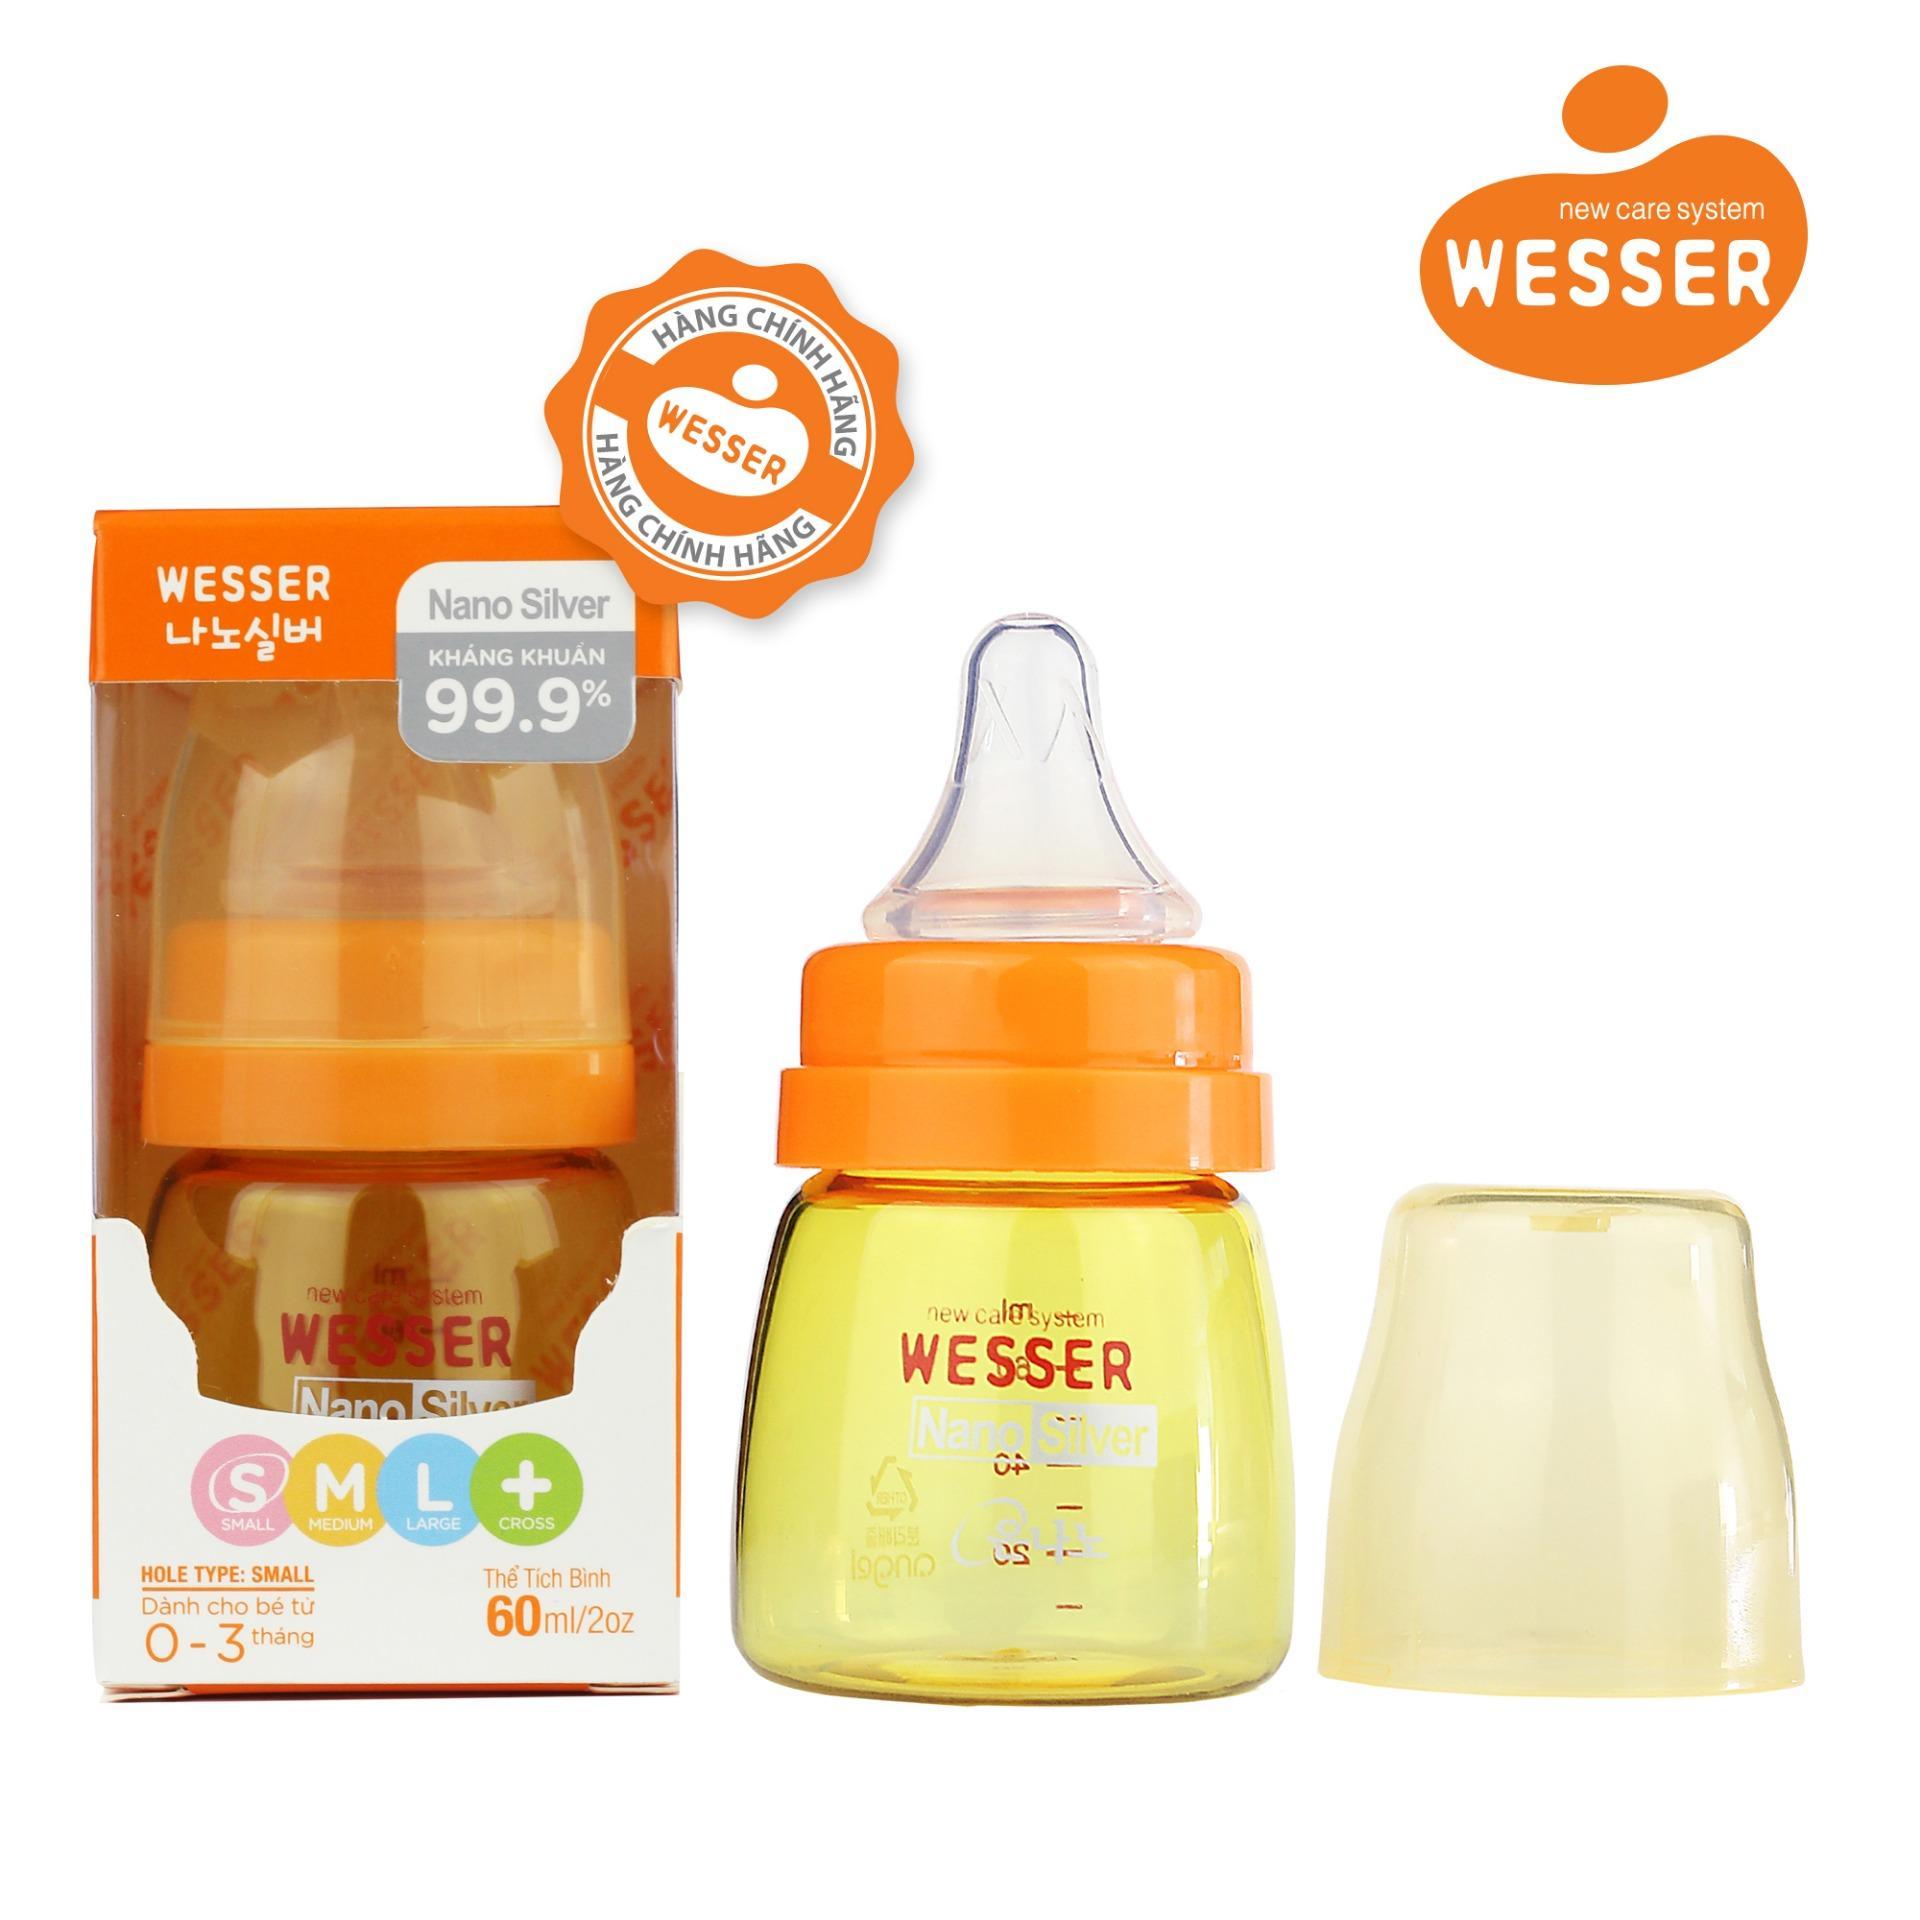 Binh Sữa Wesser Nano Silver Cổ Hẹp 60Ml Mau Vang Wesser Chiết Khấu 50